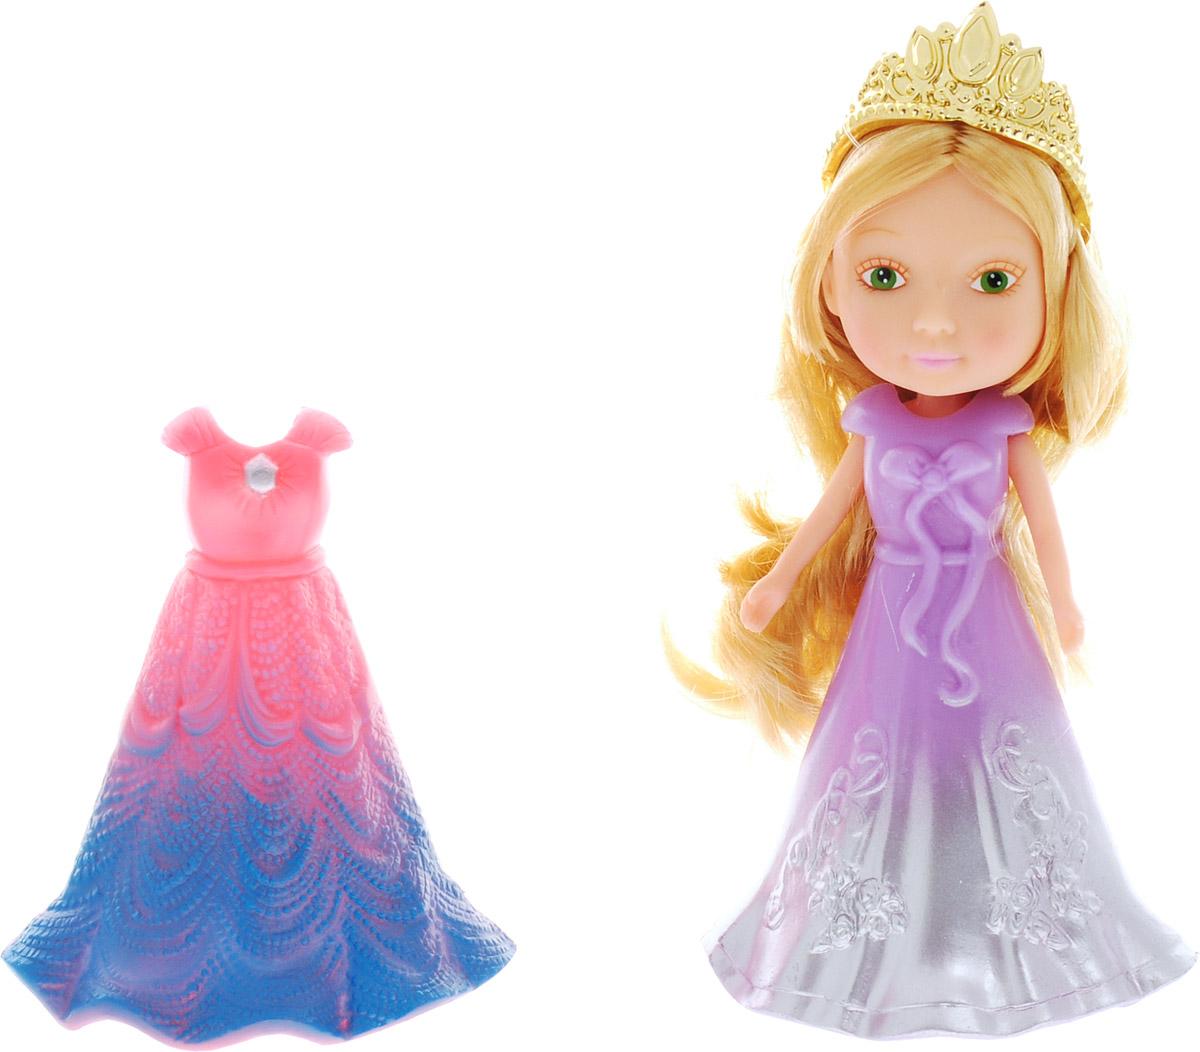 Veld-Co Мини-кукла Принцесса цвет сиреневый серебристый розовый veld co барабан цвет синий